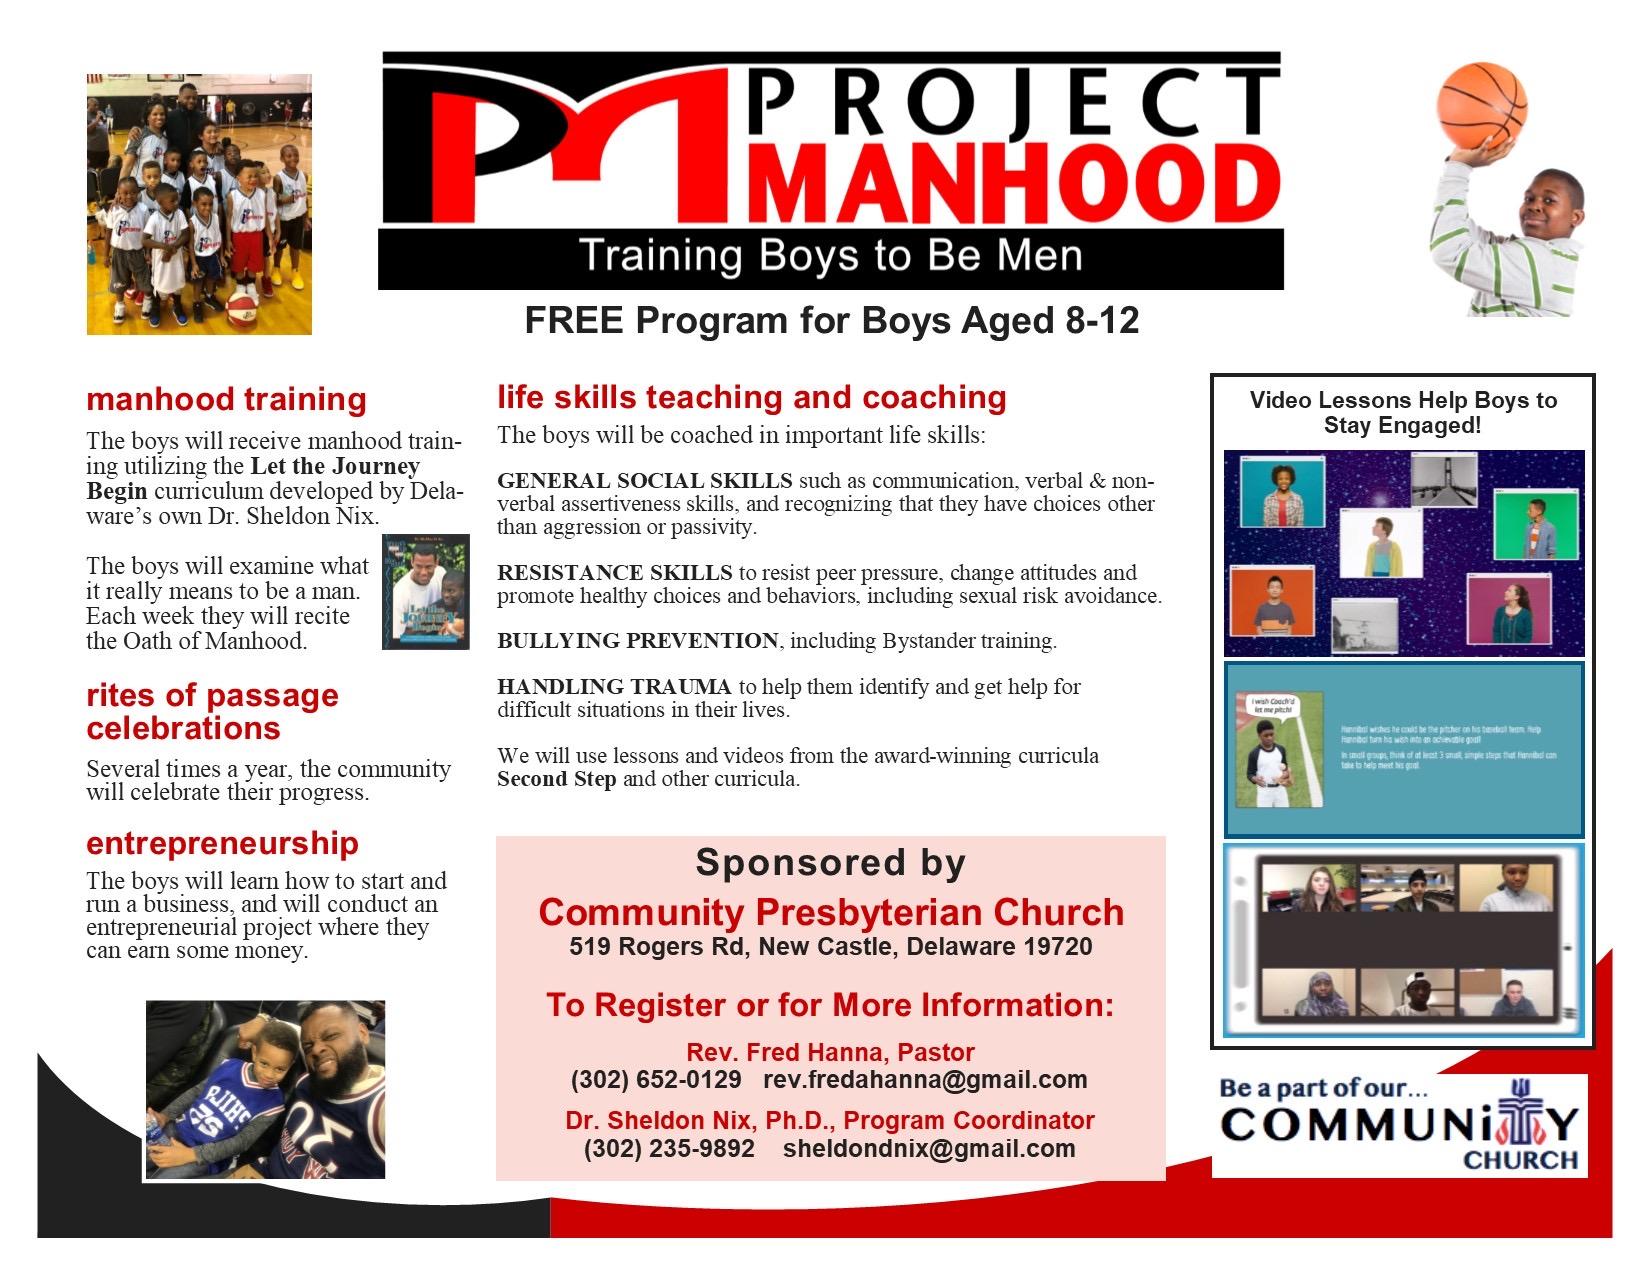 projectmanhood.JPG